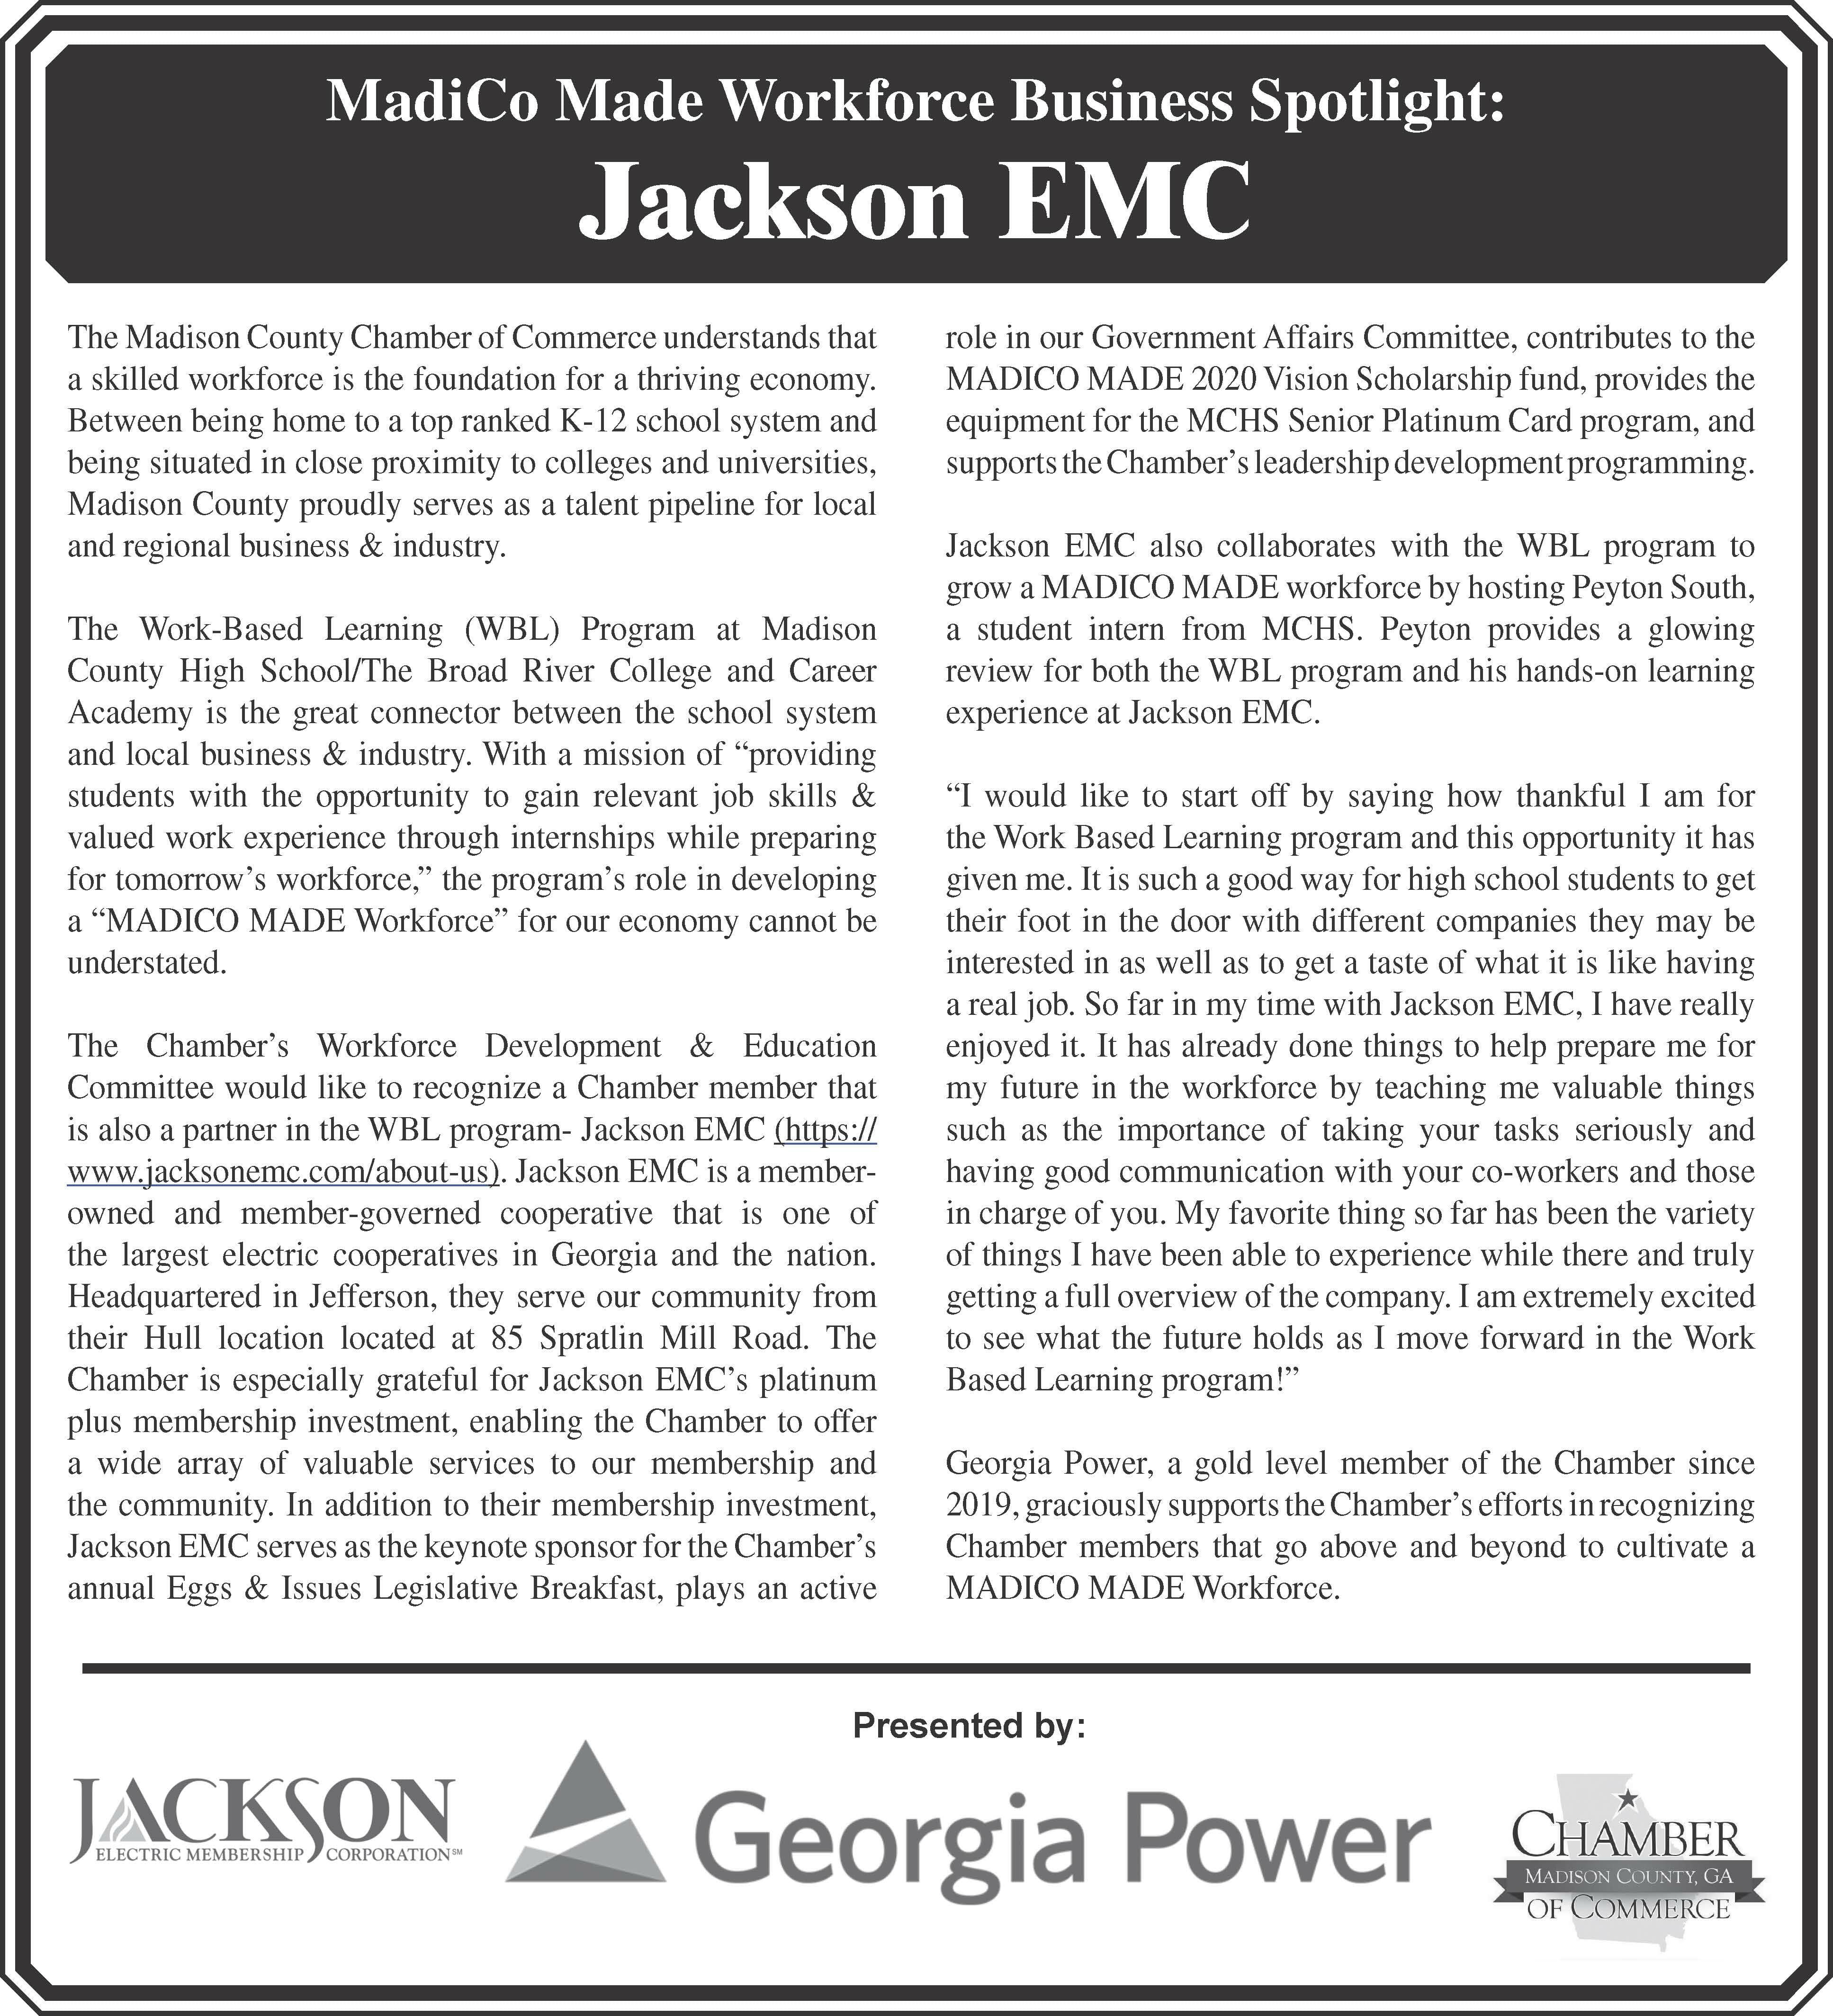 MM Workforce Spotlight_JEMC